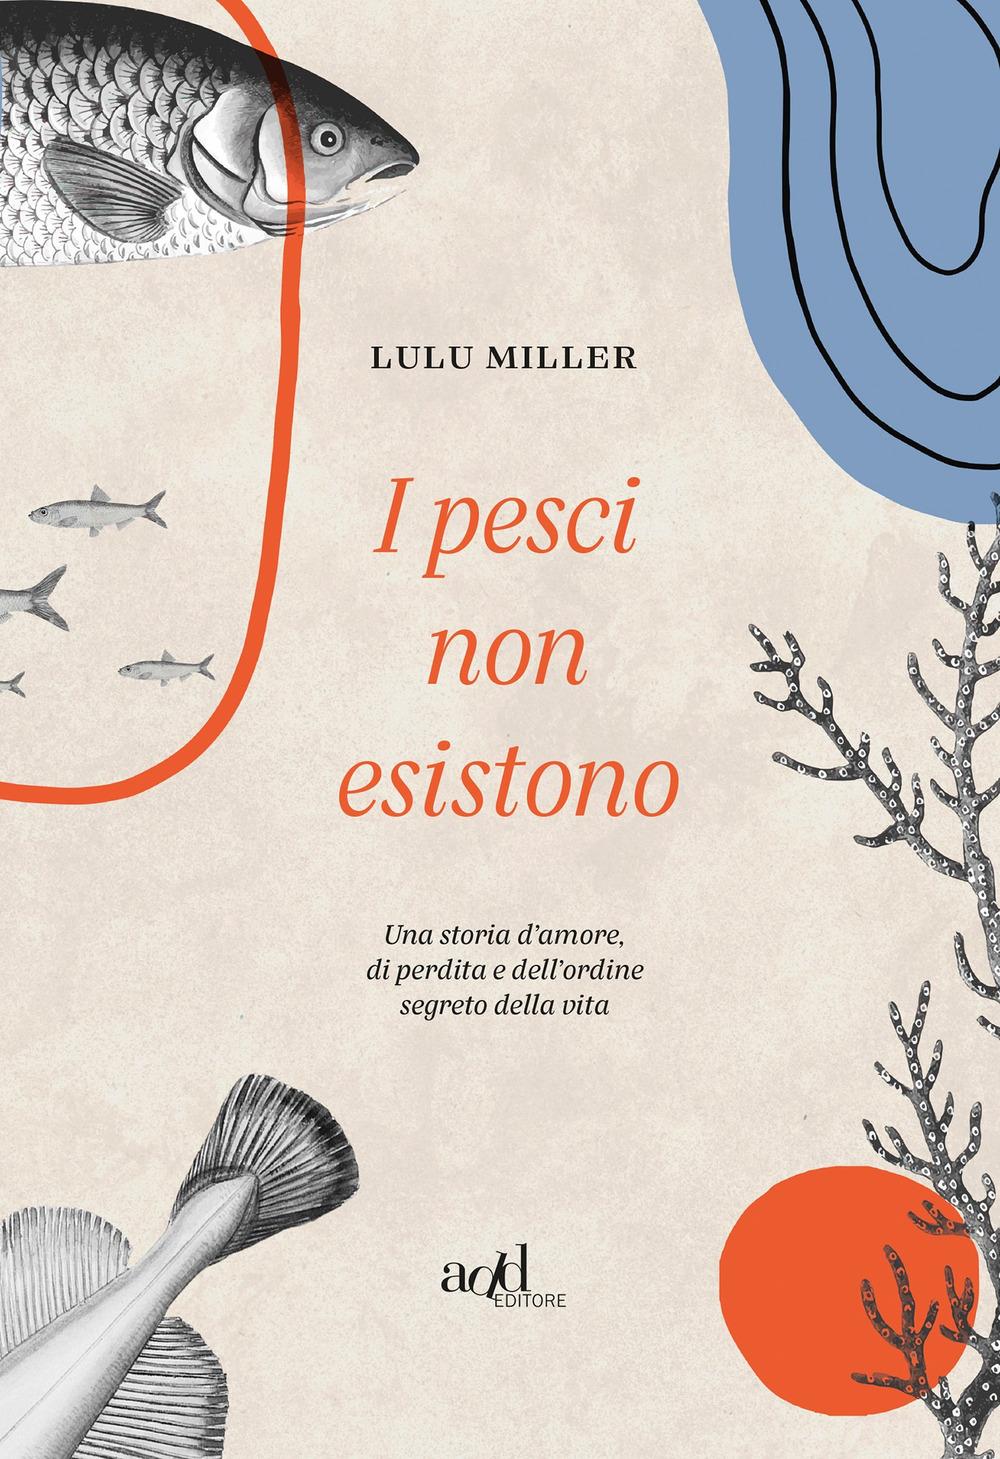 I pesci non esistono – Lulu Miller